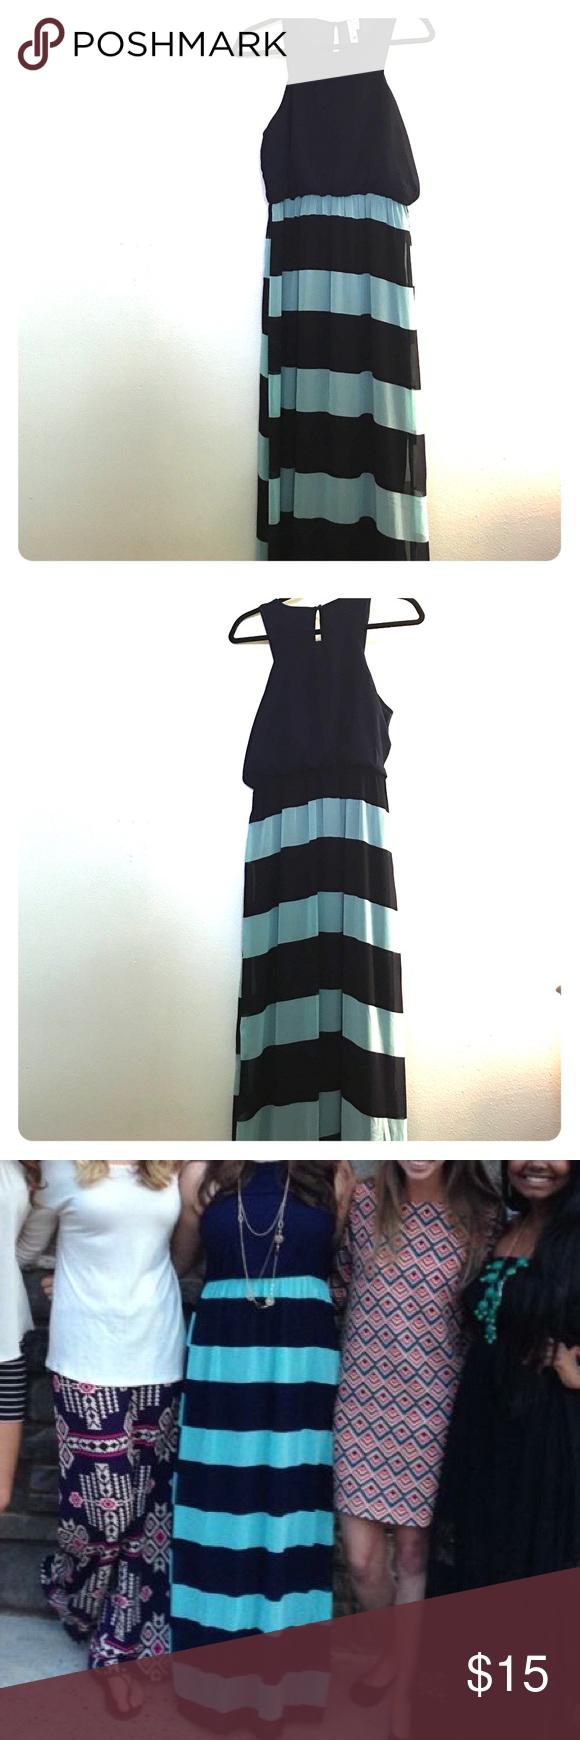 Navy Blue and Light Blue Striped Maxi Dress Fun and flirty sleeveless maxi dress with a navy blue top and striped navy and light blue skirt Dresses Maxi